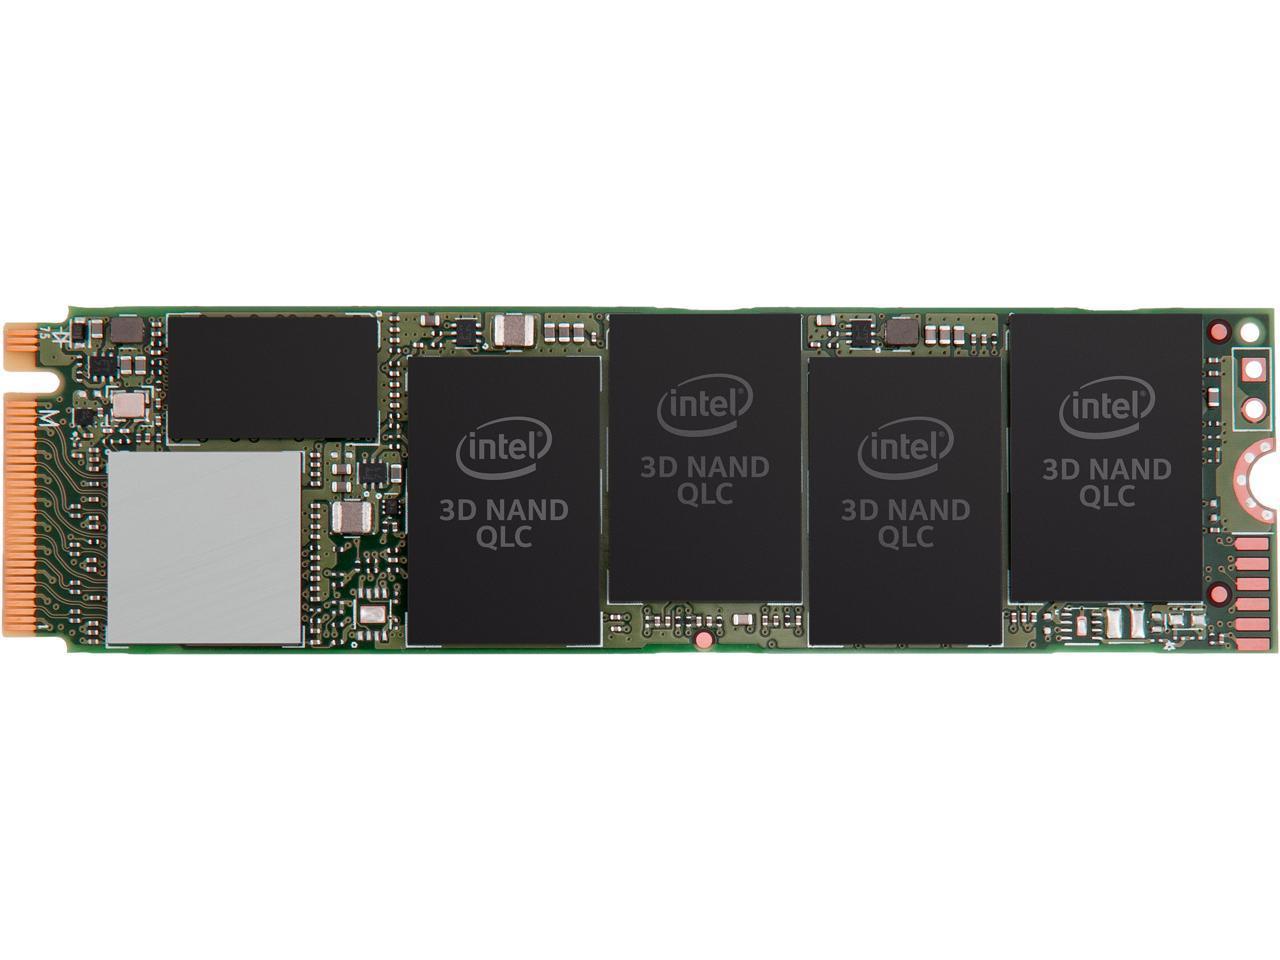 Intel 665p PCIe NVMe 3.0 1TB M.2 2280 Internal Solid State Drive (SSD) SSDPEKNW010T9X1